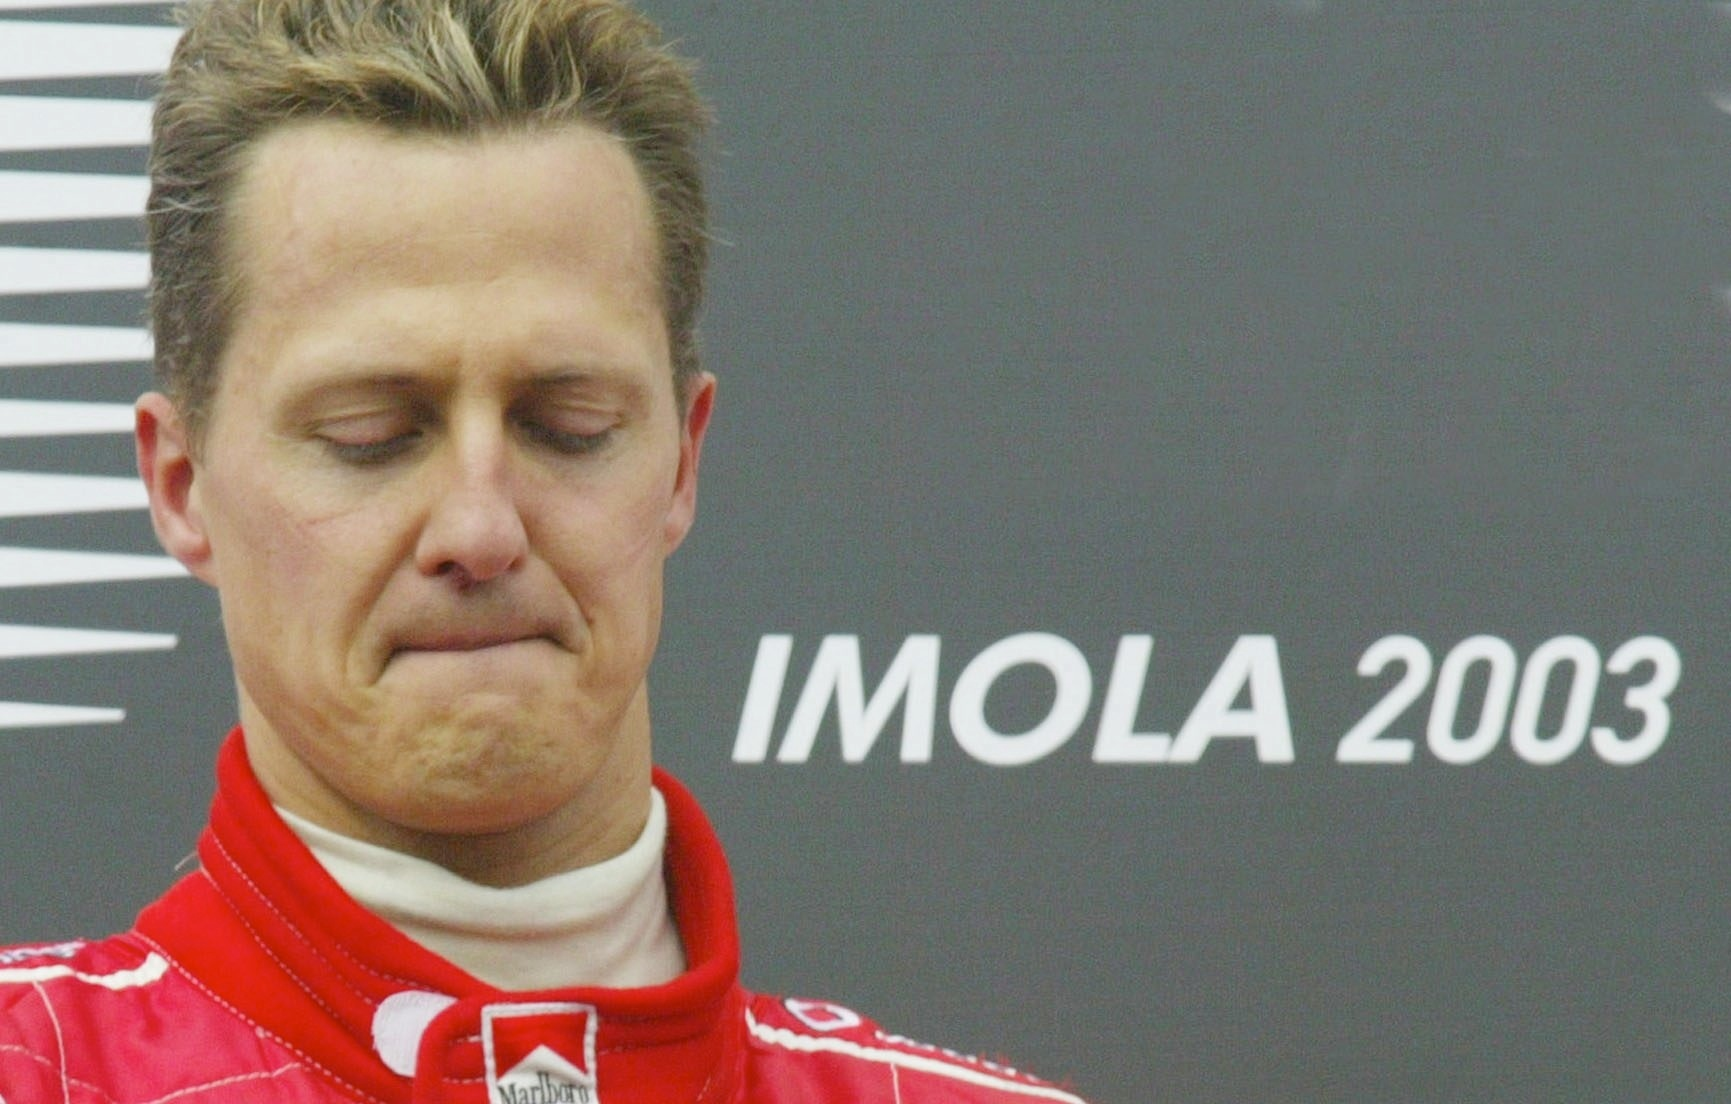 Formula One: Former manager reveals Michael Schumacher's 'secret plan' before tragedy